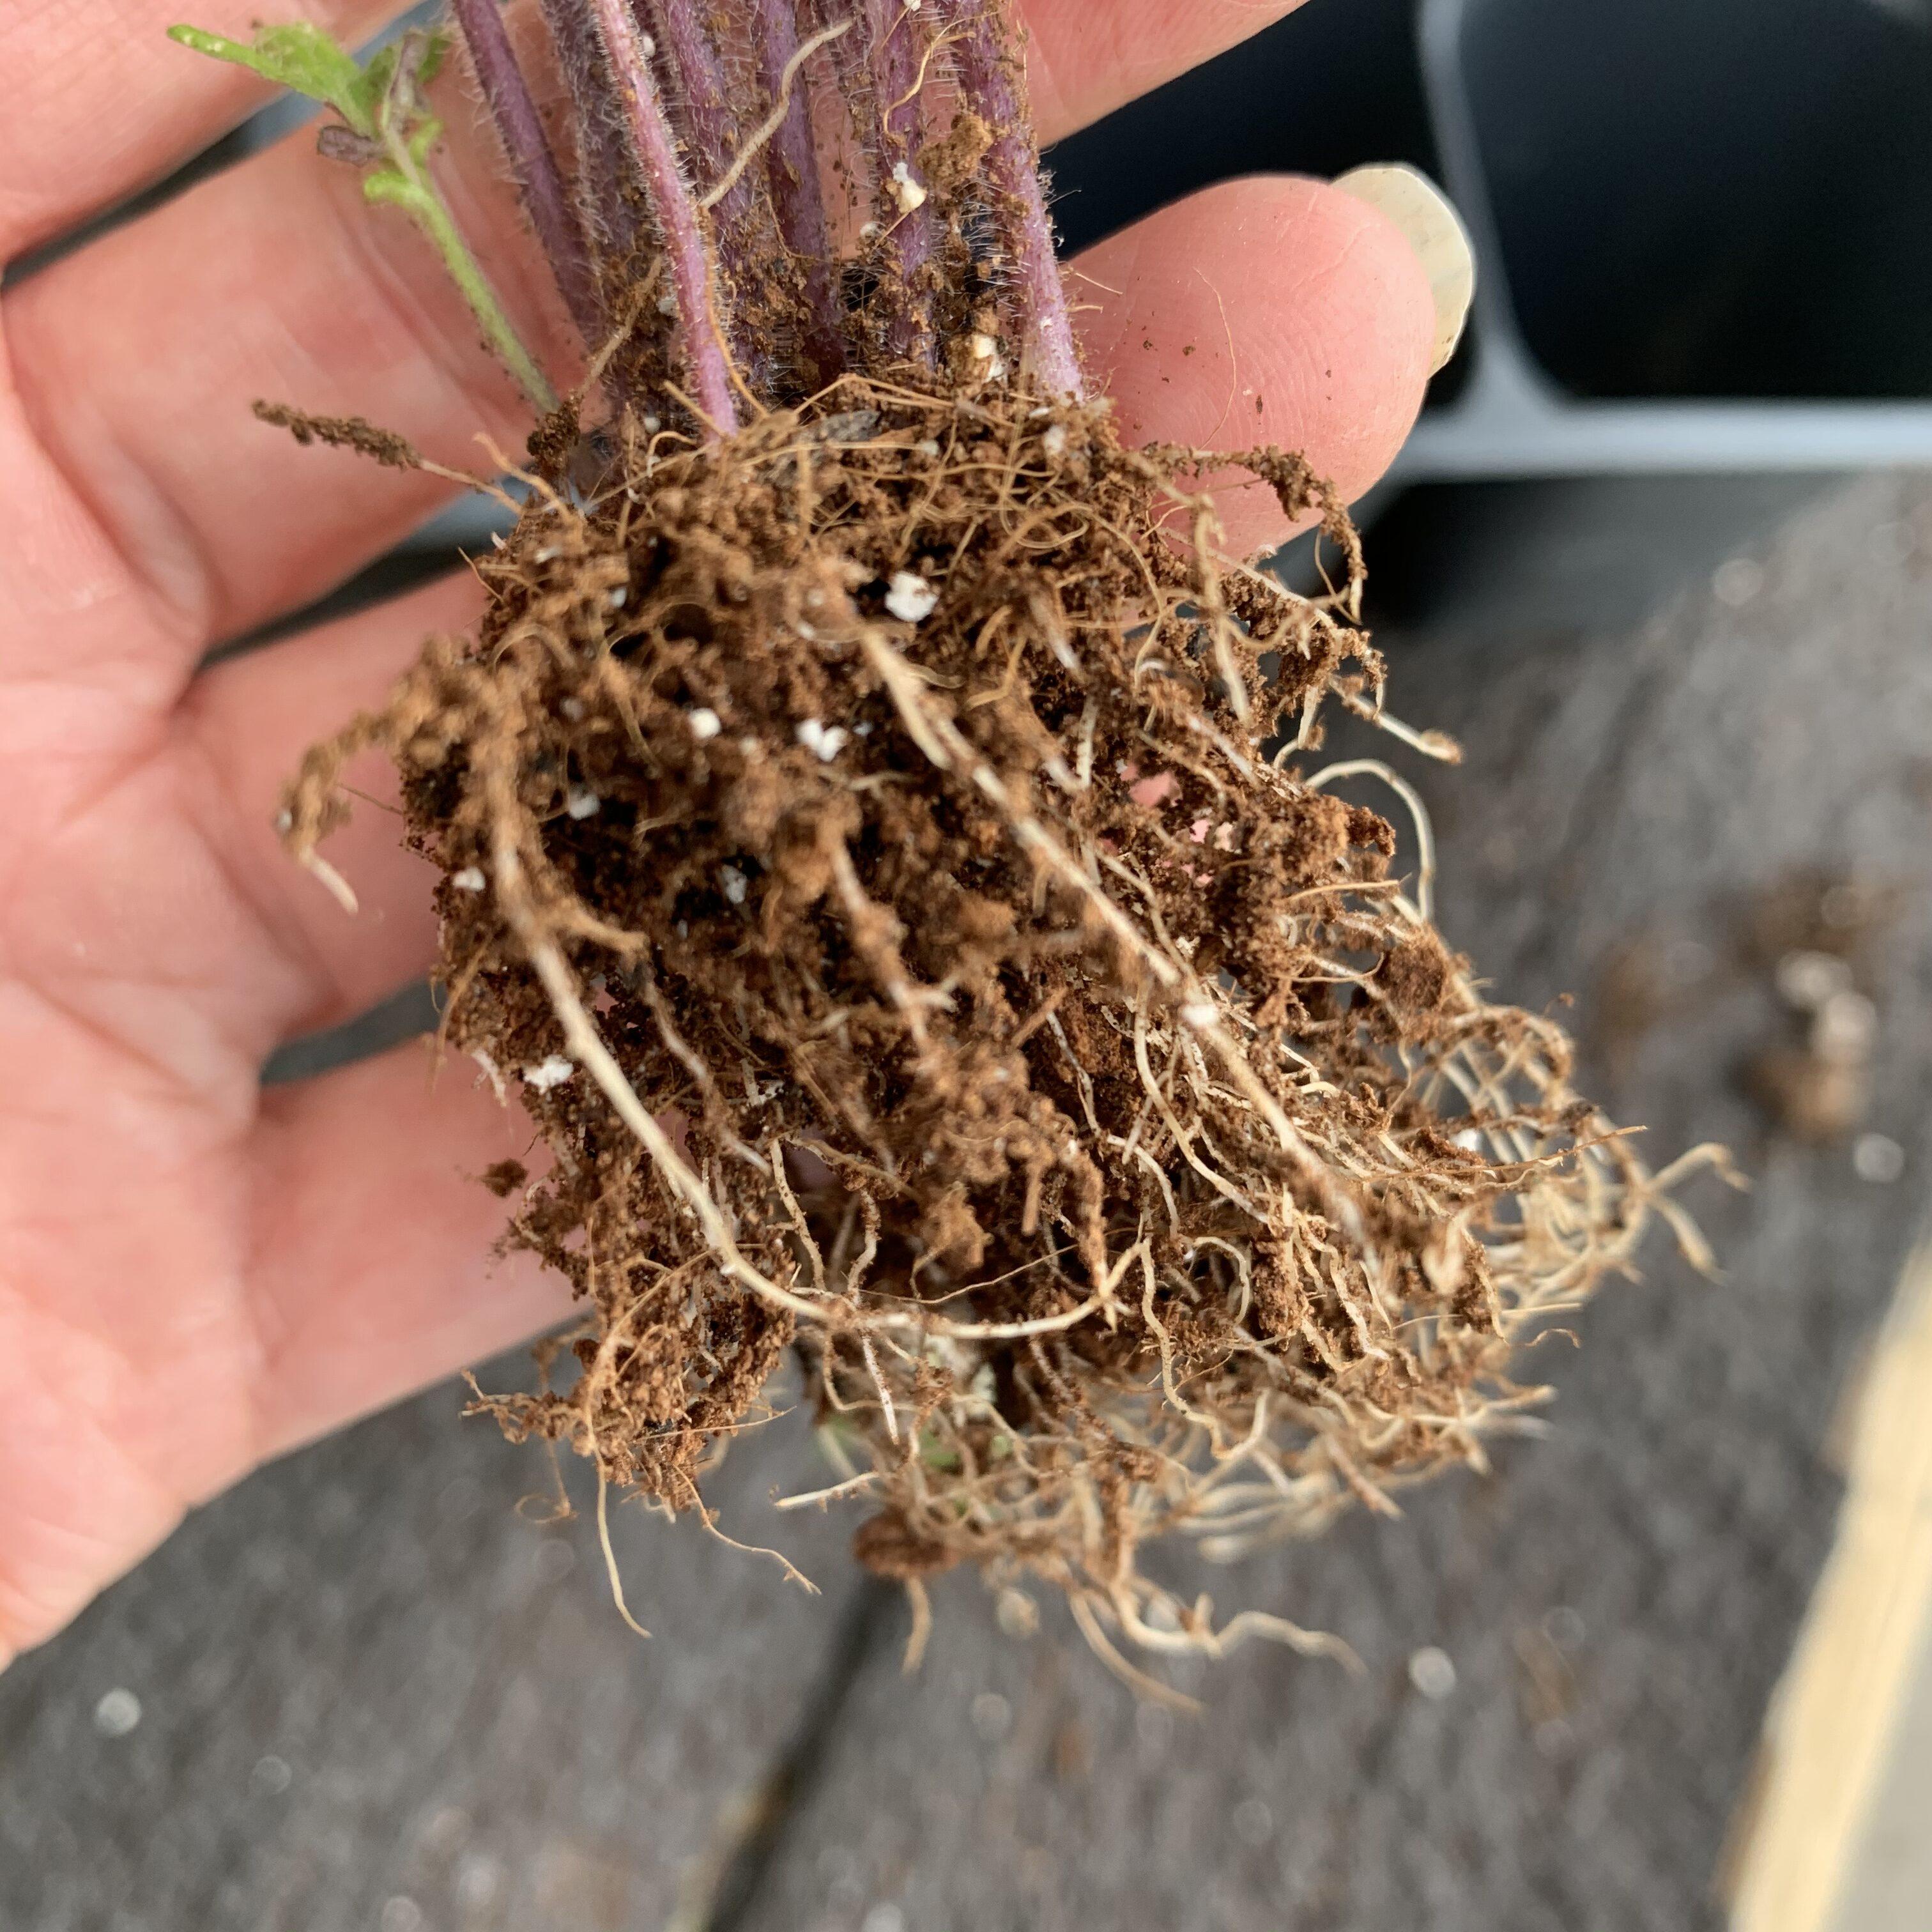 63D19CFC E58C 4471 8E99 D475BDB52F38 Comparing Burpee Organic Seed Starting Mix vs Miracle Gro Moisture Control Potting Mix for transplanted tomato seedlings